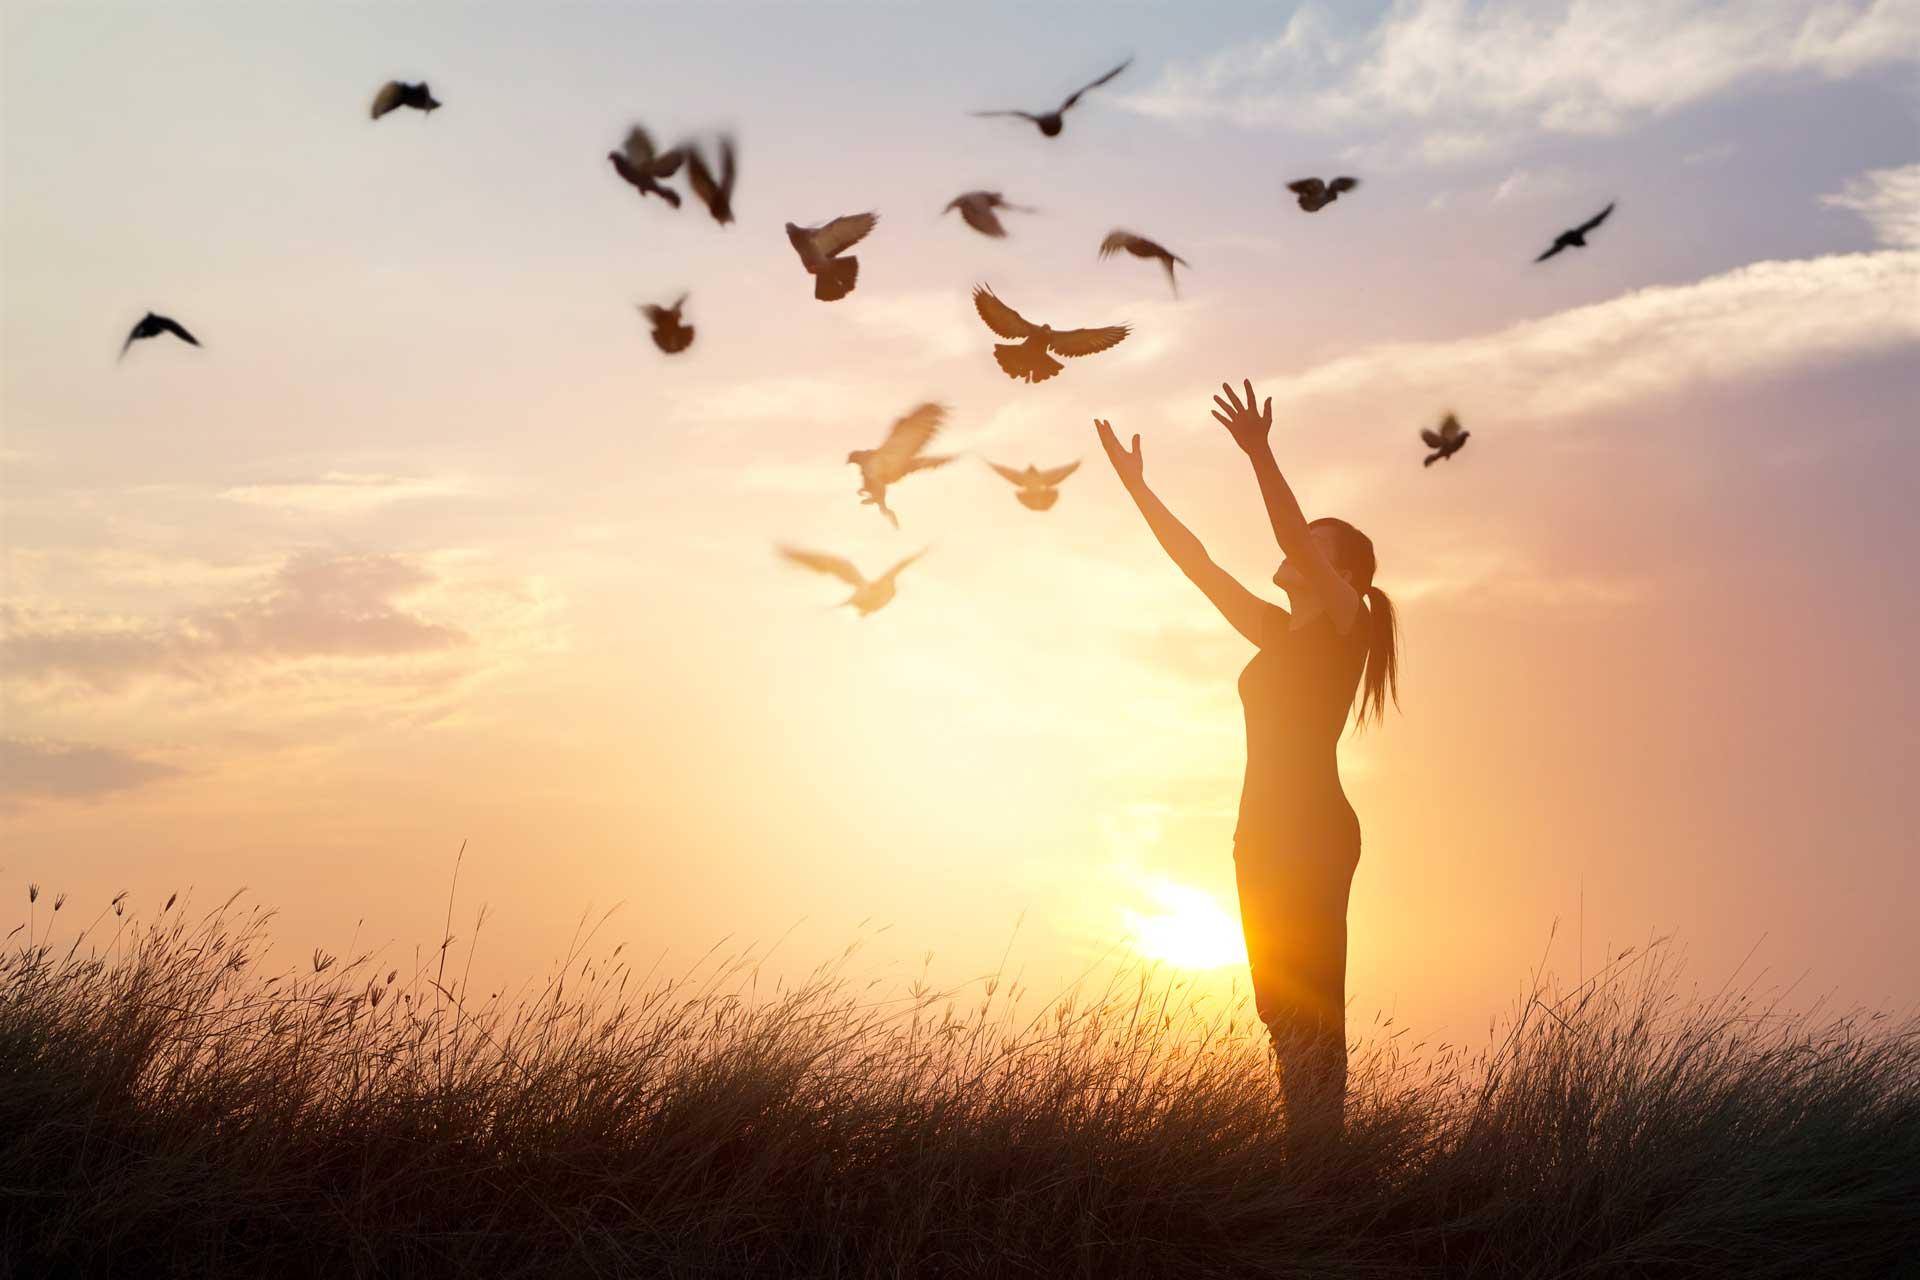 woman-praying-free-birds-nature-sunset-background